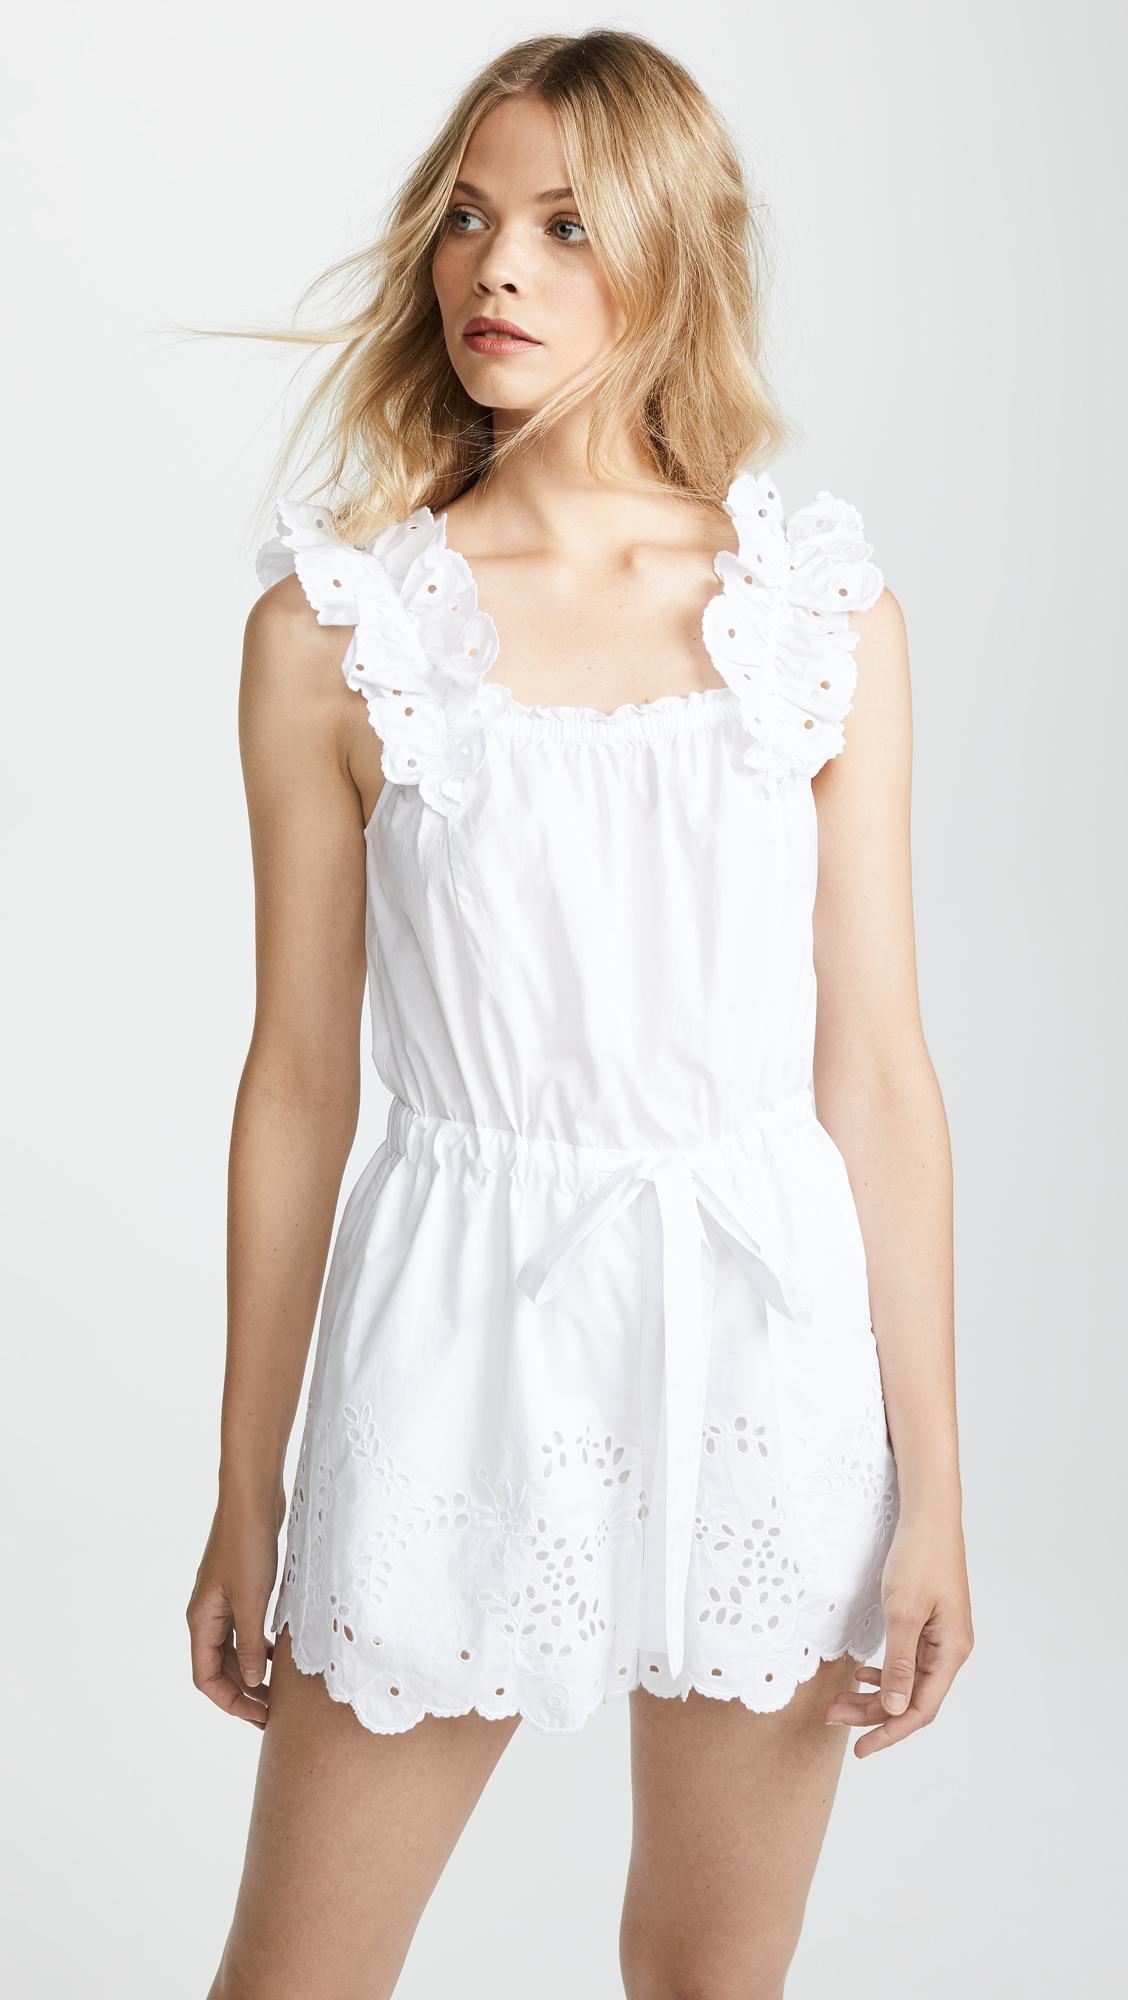 ec31c7e5c7bb Lyst - La Vie Rebecca Taylor Eyelet Romper in White